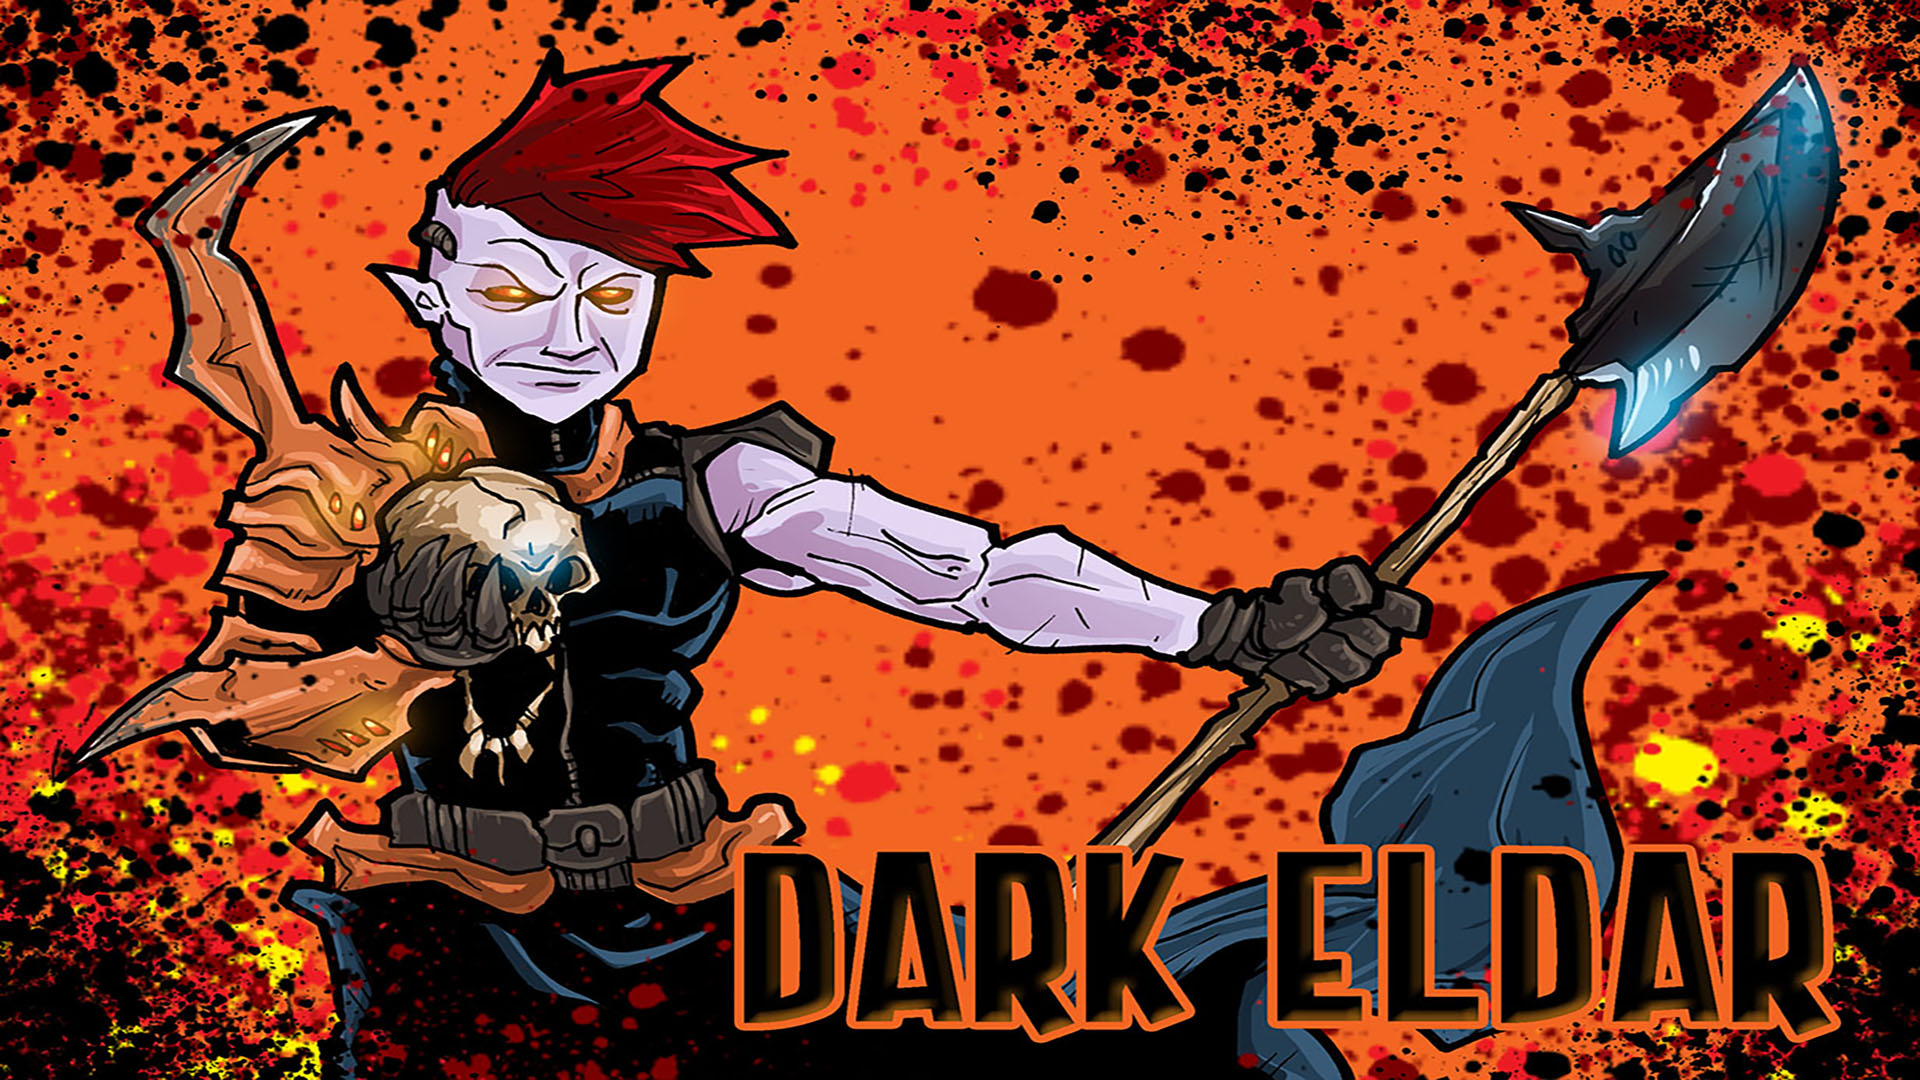 dark.eldar.1920x1080.jpg